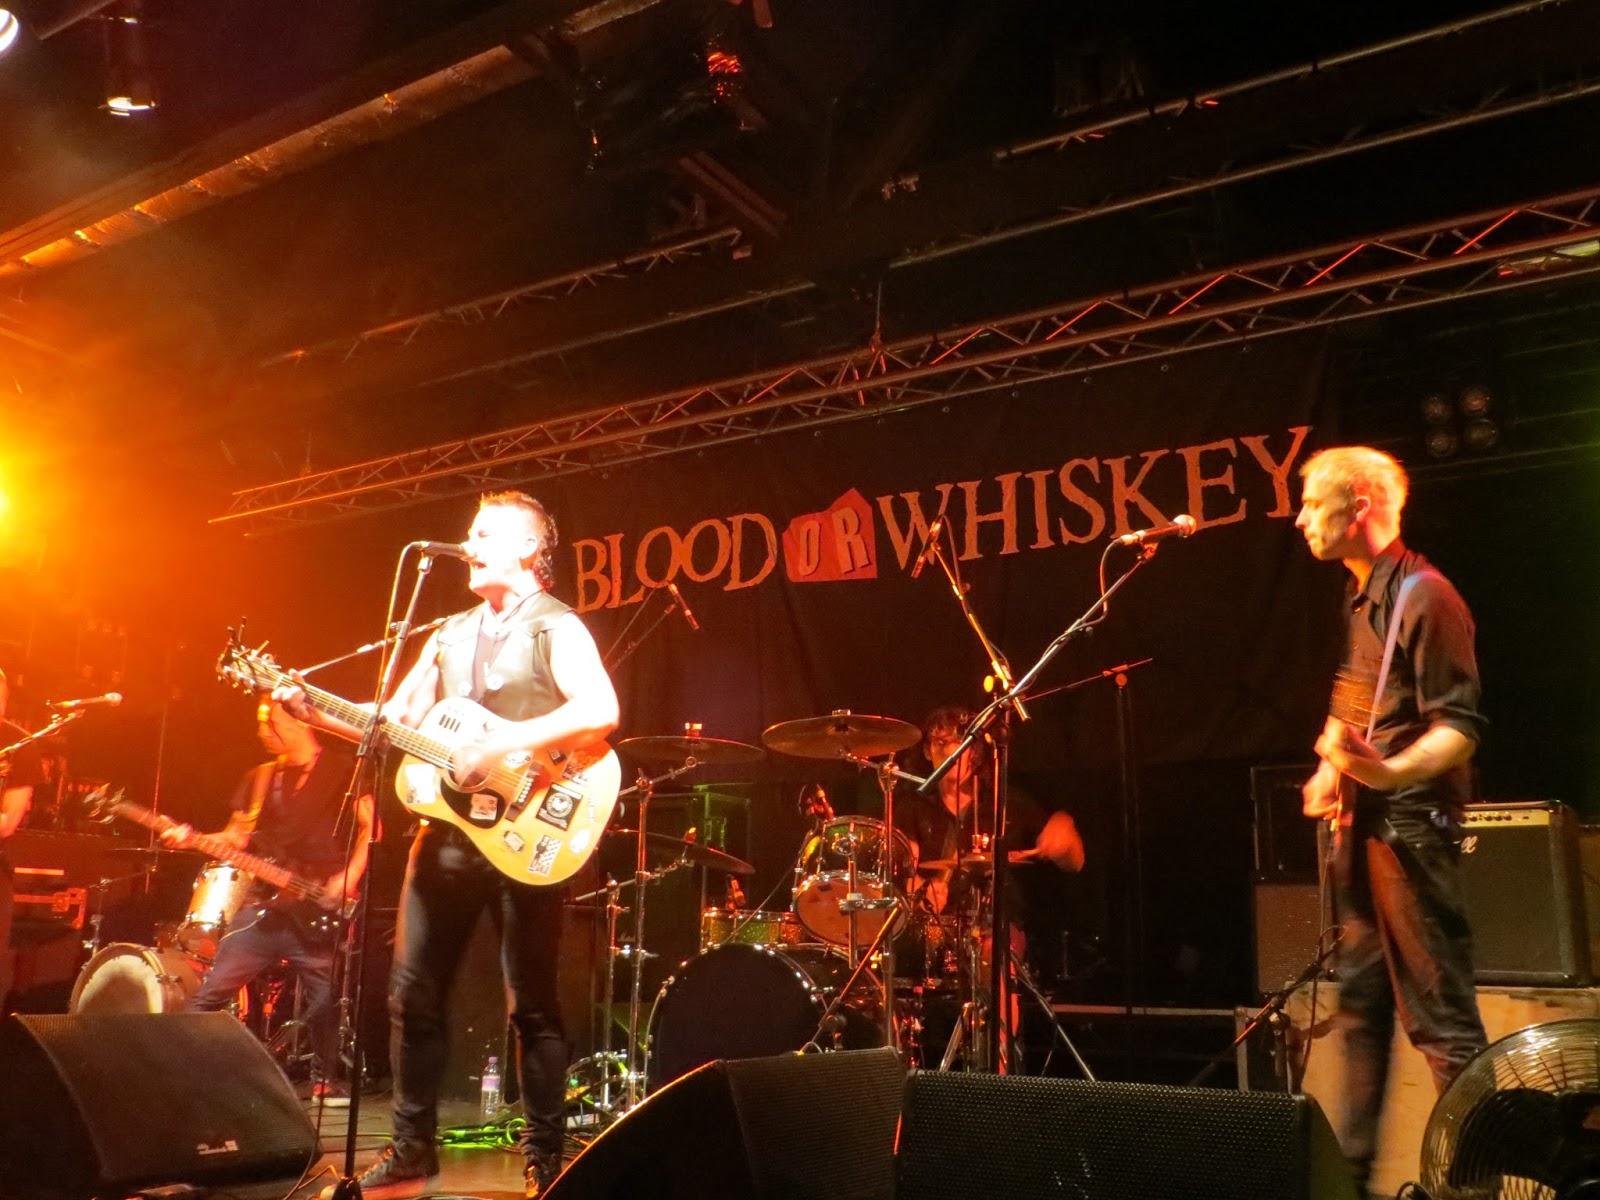 "blood or whiskey, Dropkick murphys, liverpool, ken casey, al barr, on stage, meeting band, gig, punk, celtic punk, boston, getting on stage with the dropkick murphys, bands, live music, atmosphere, close, barrier, rail, front row, Matt Kelly, James Lynch, Tim Brennan, Josh ""Scruffy"" Wallace, Jeff DaRosa, banjos, irish music, bagpipes,"